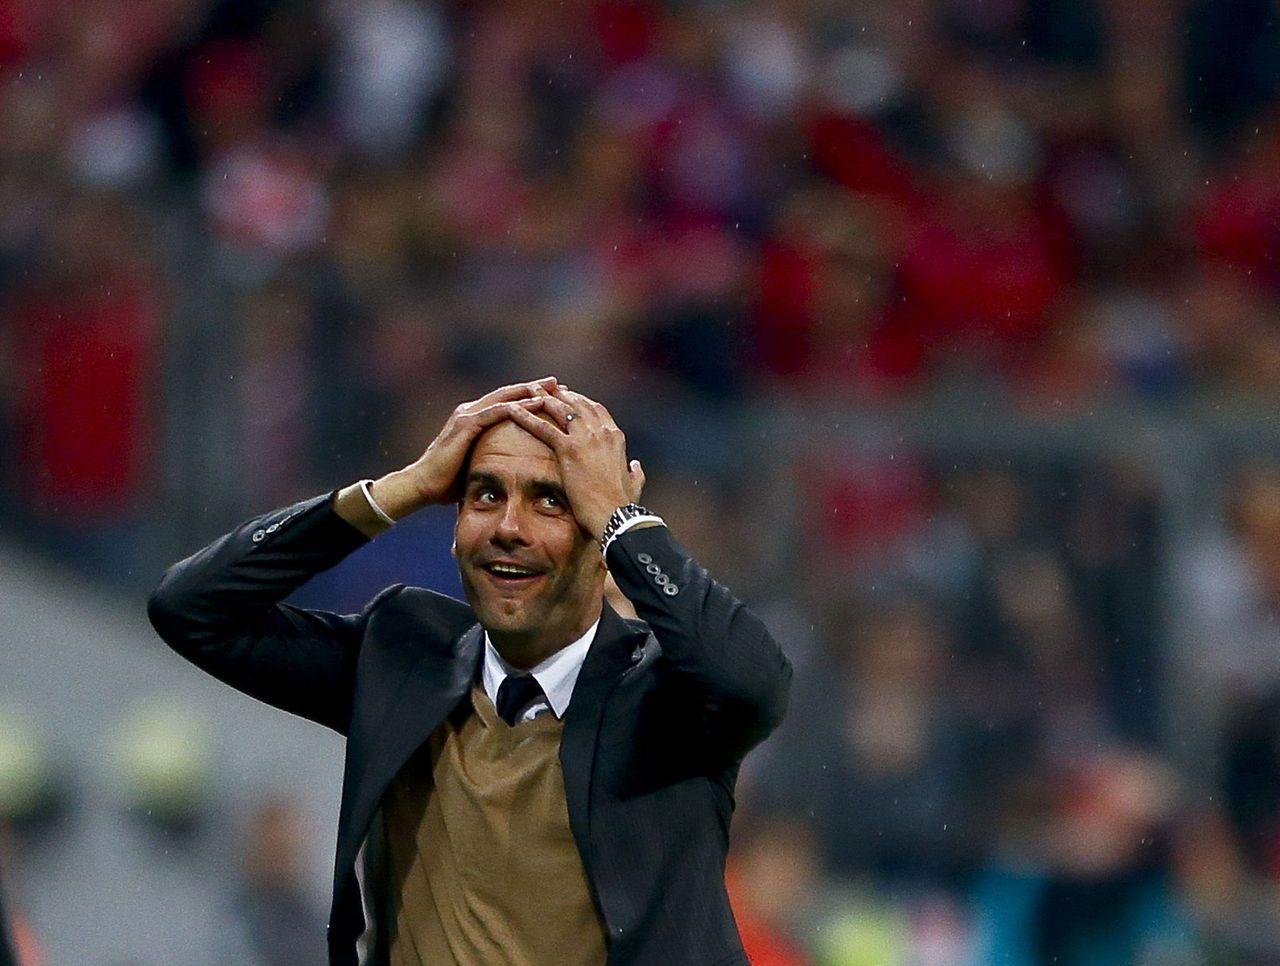 VIDEO: Pep Guardiola's reaction to Lewandowski's scoring explosion is  perfect   Pep guardiola, Manchester city, Promesa